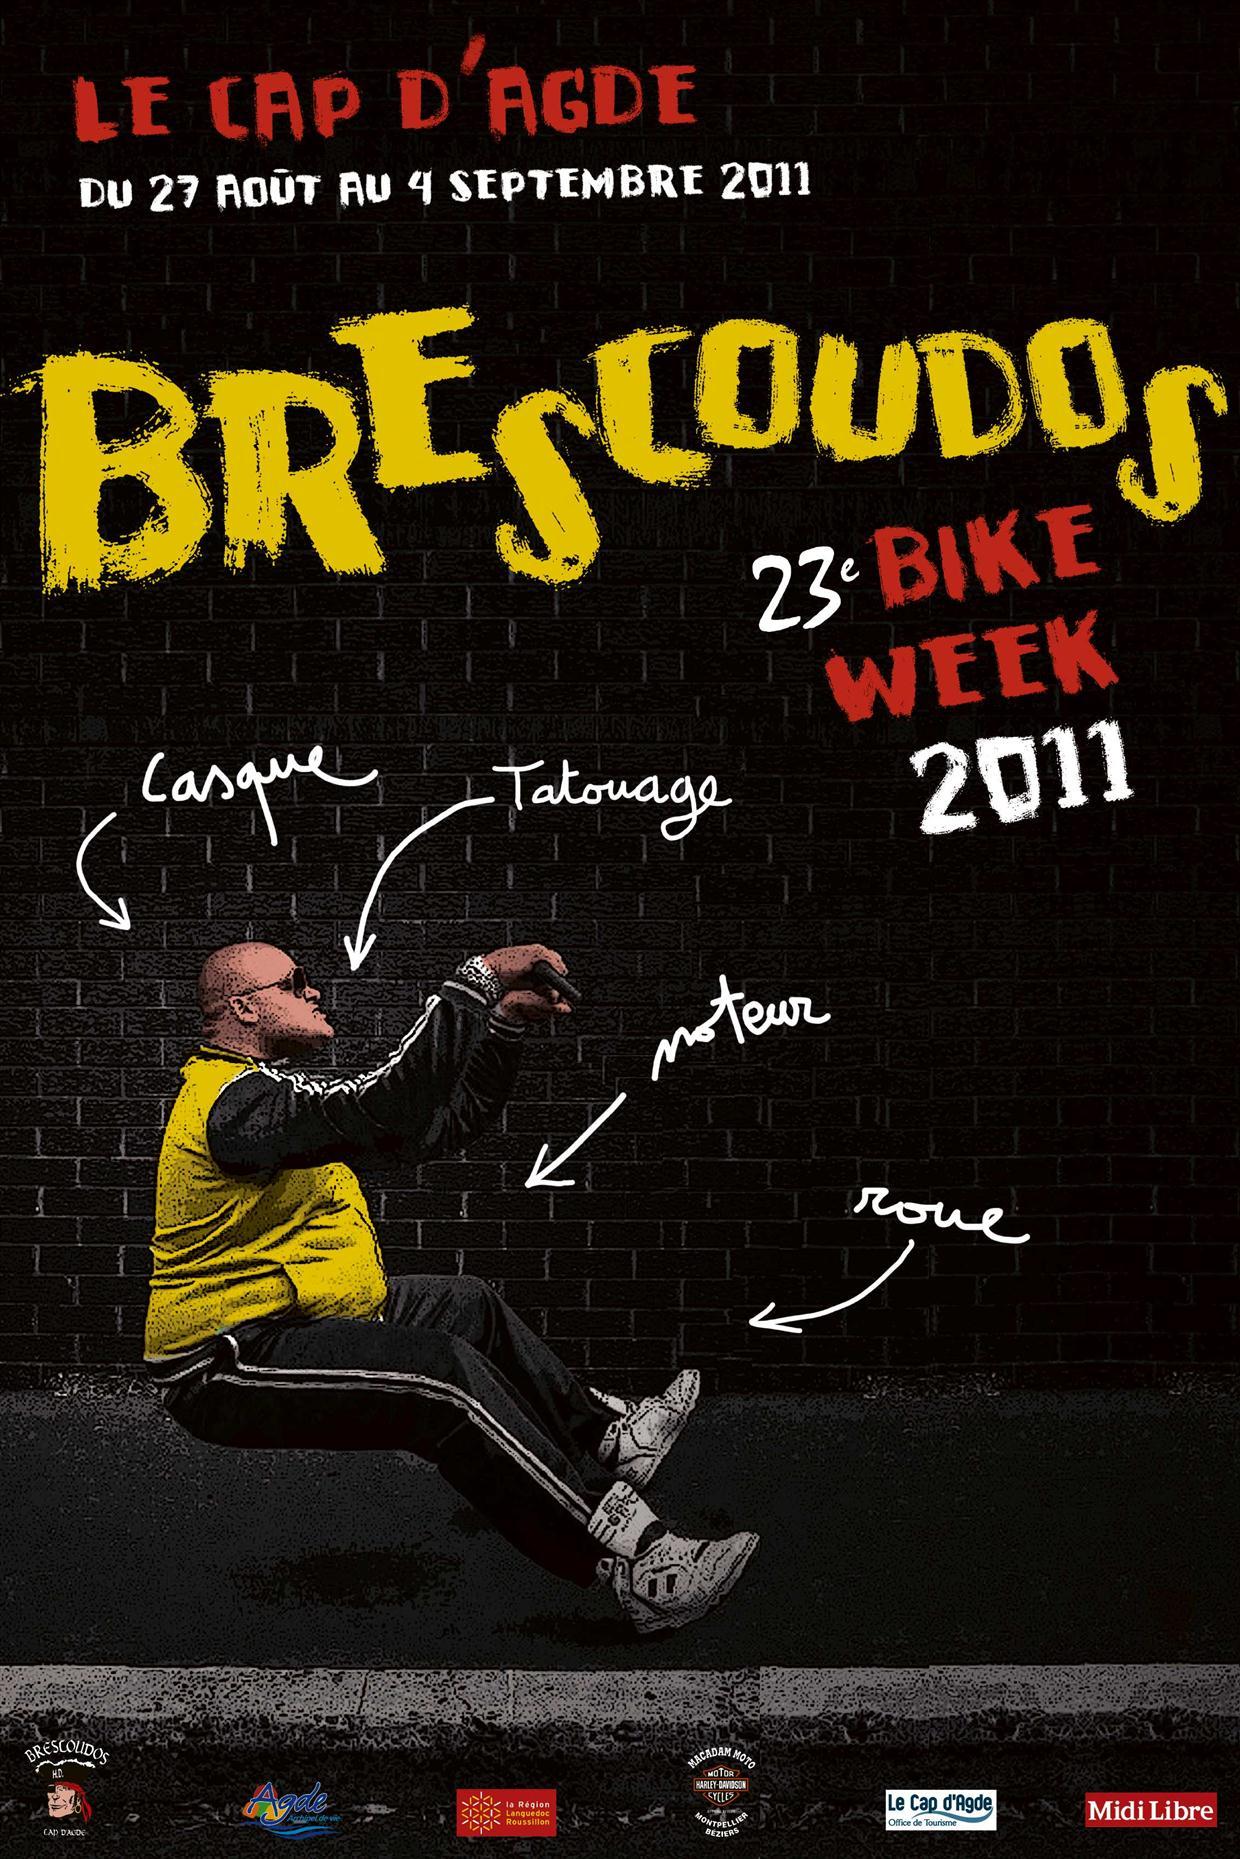 Affiche de la 23ème Brescoudos Bike Week